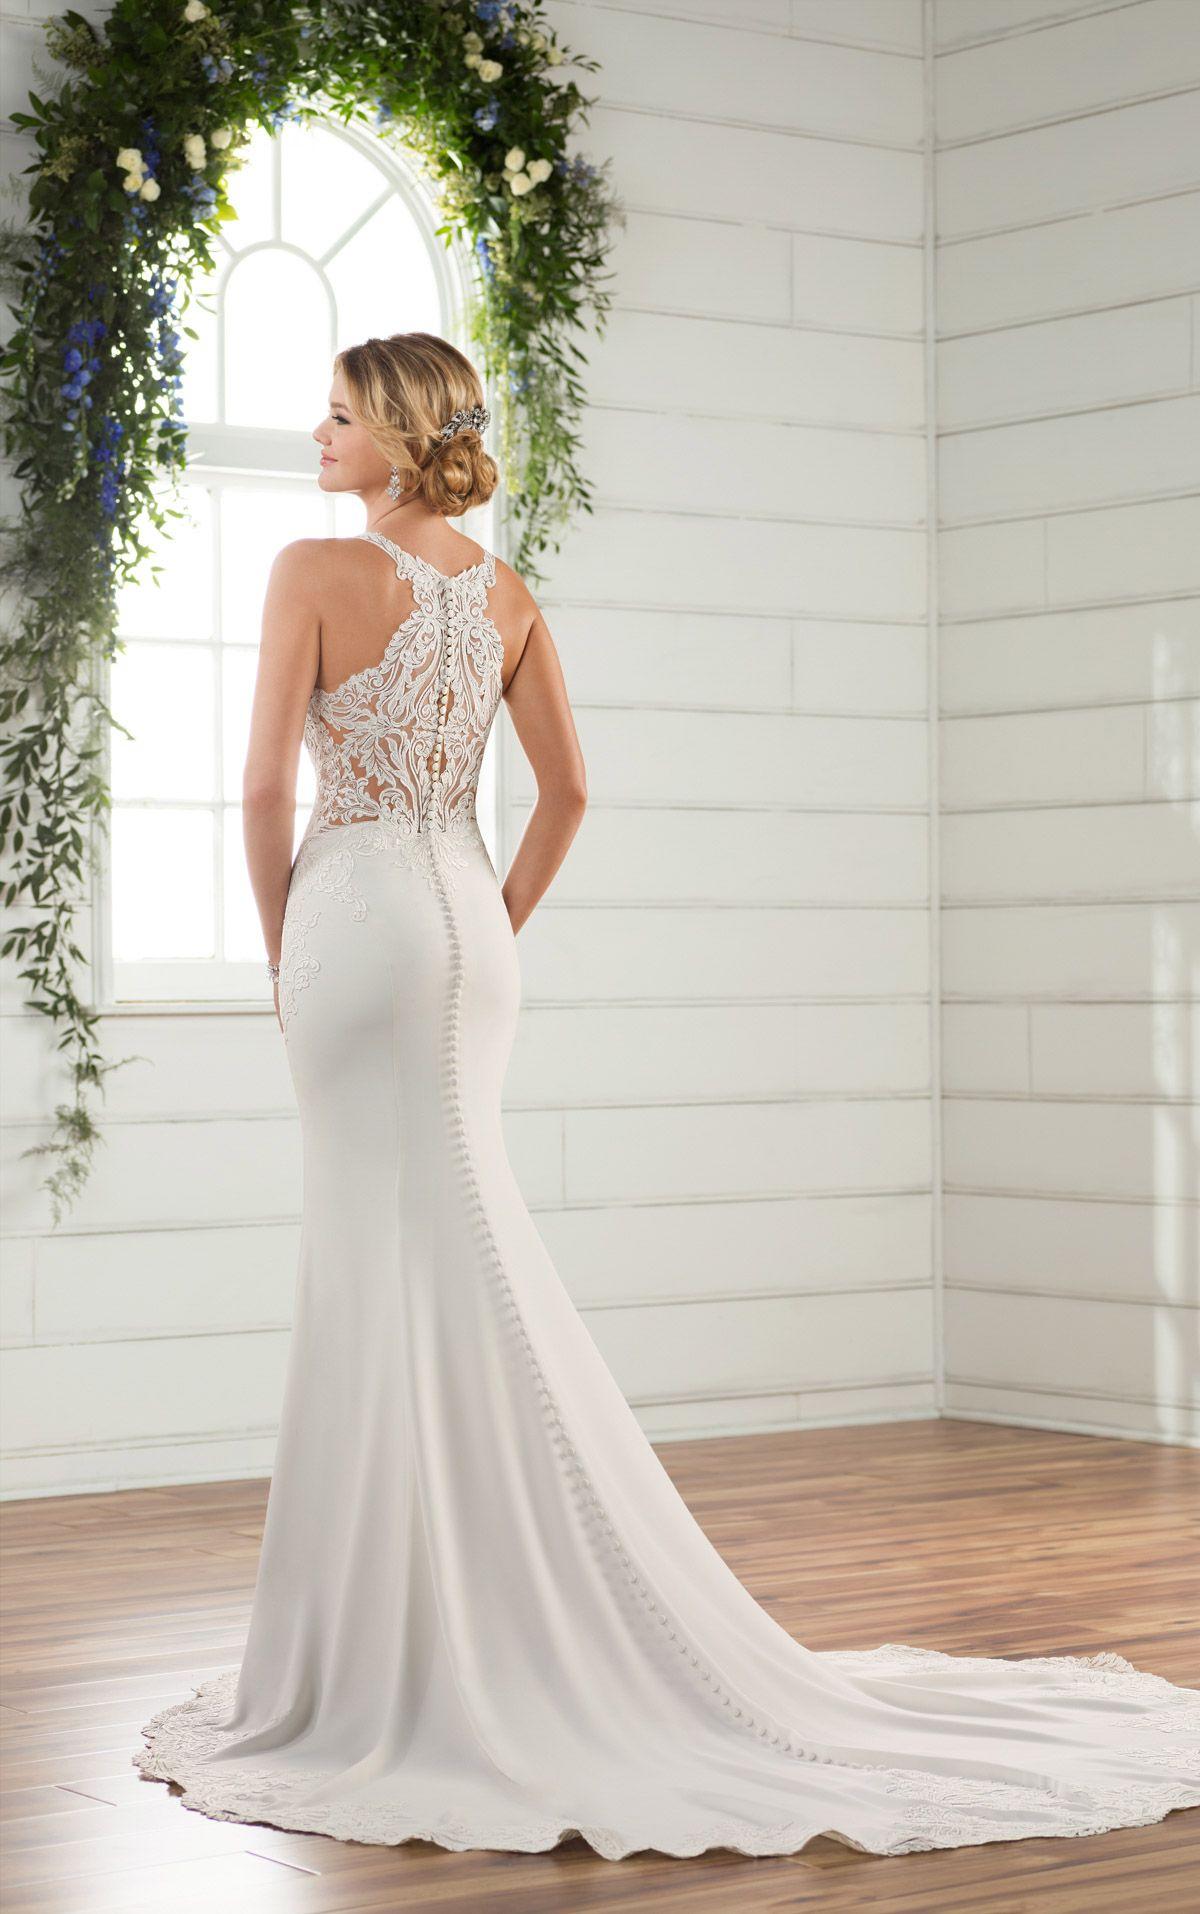 Beach Wedding Dresses (With images) Essence of australia